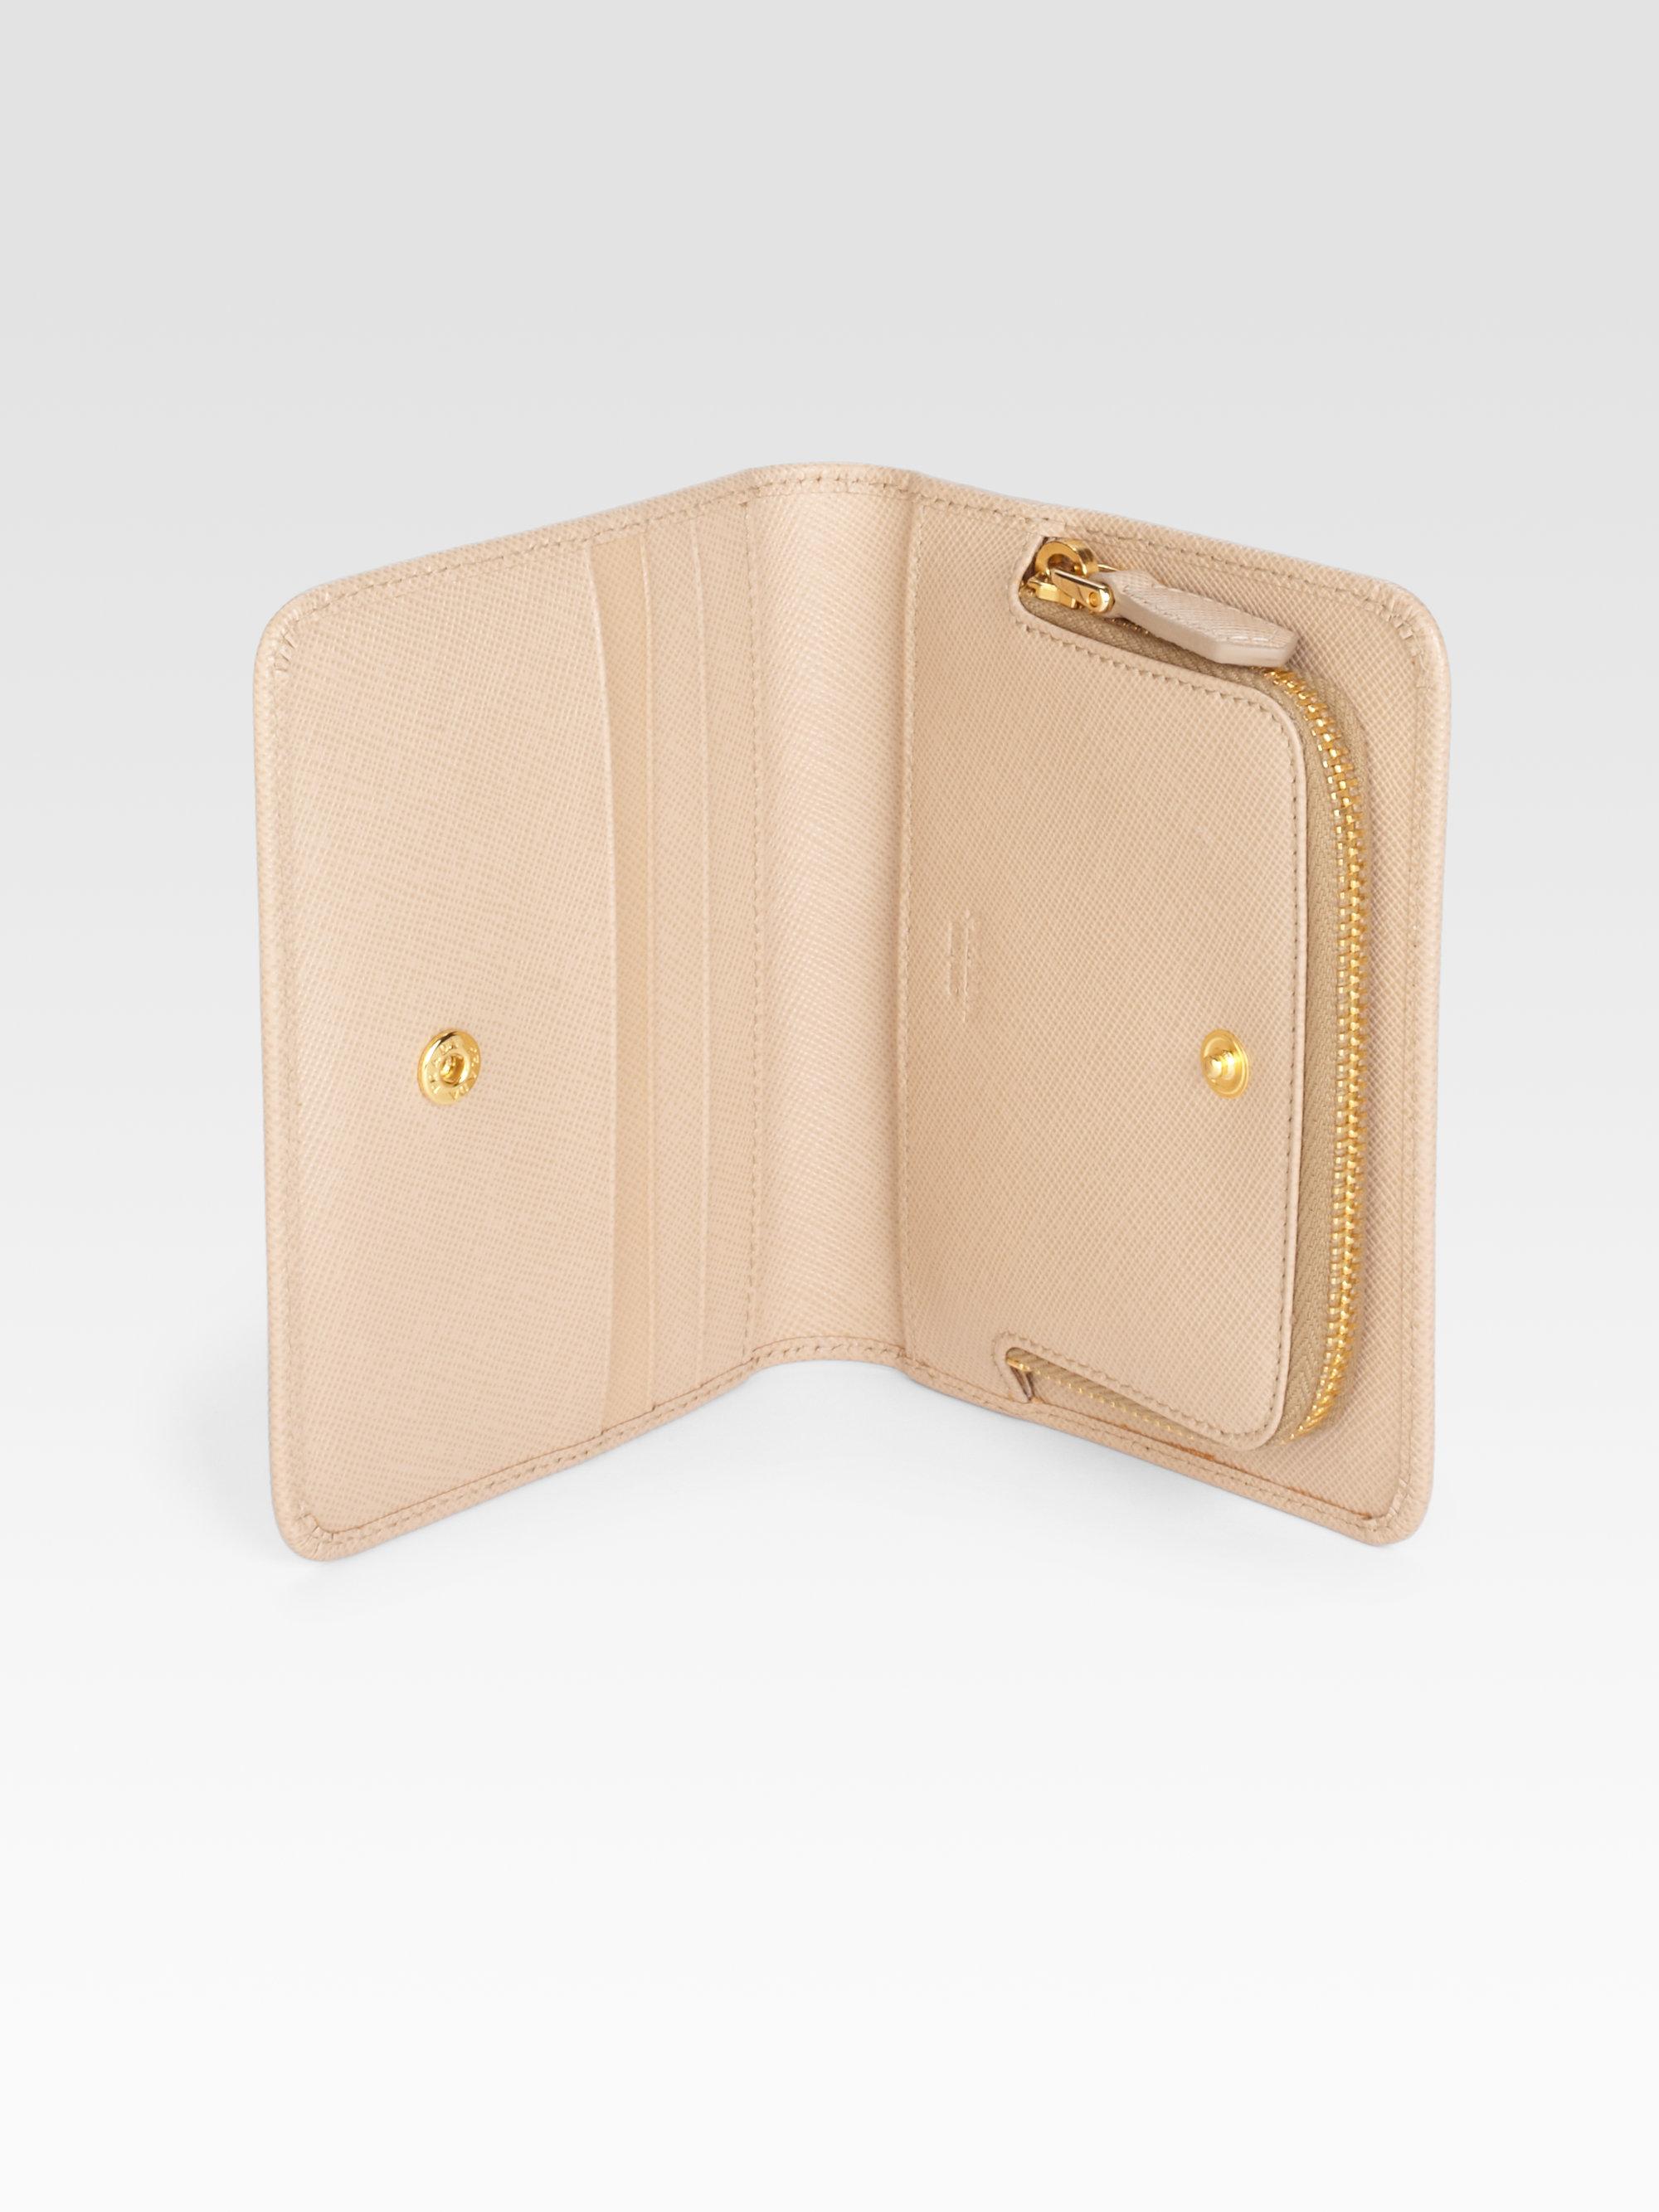 Prada Saffiano Metal Wallet in Beige (sand) | Lyst